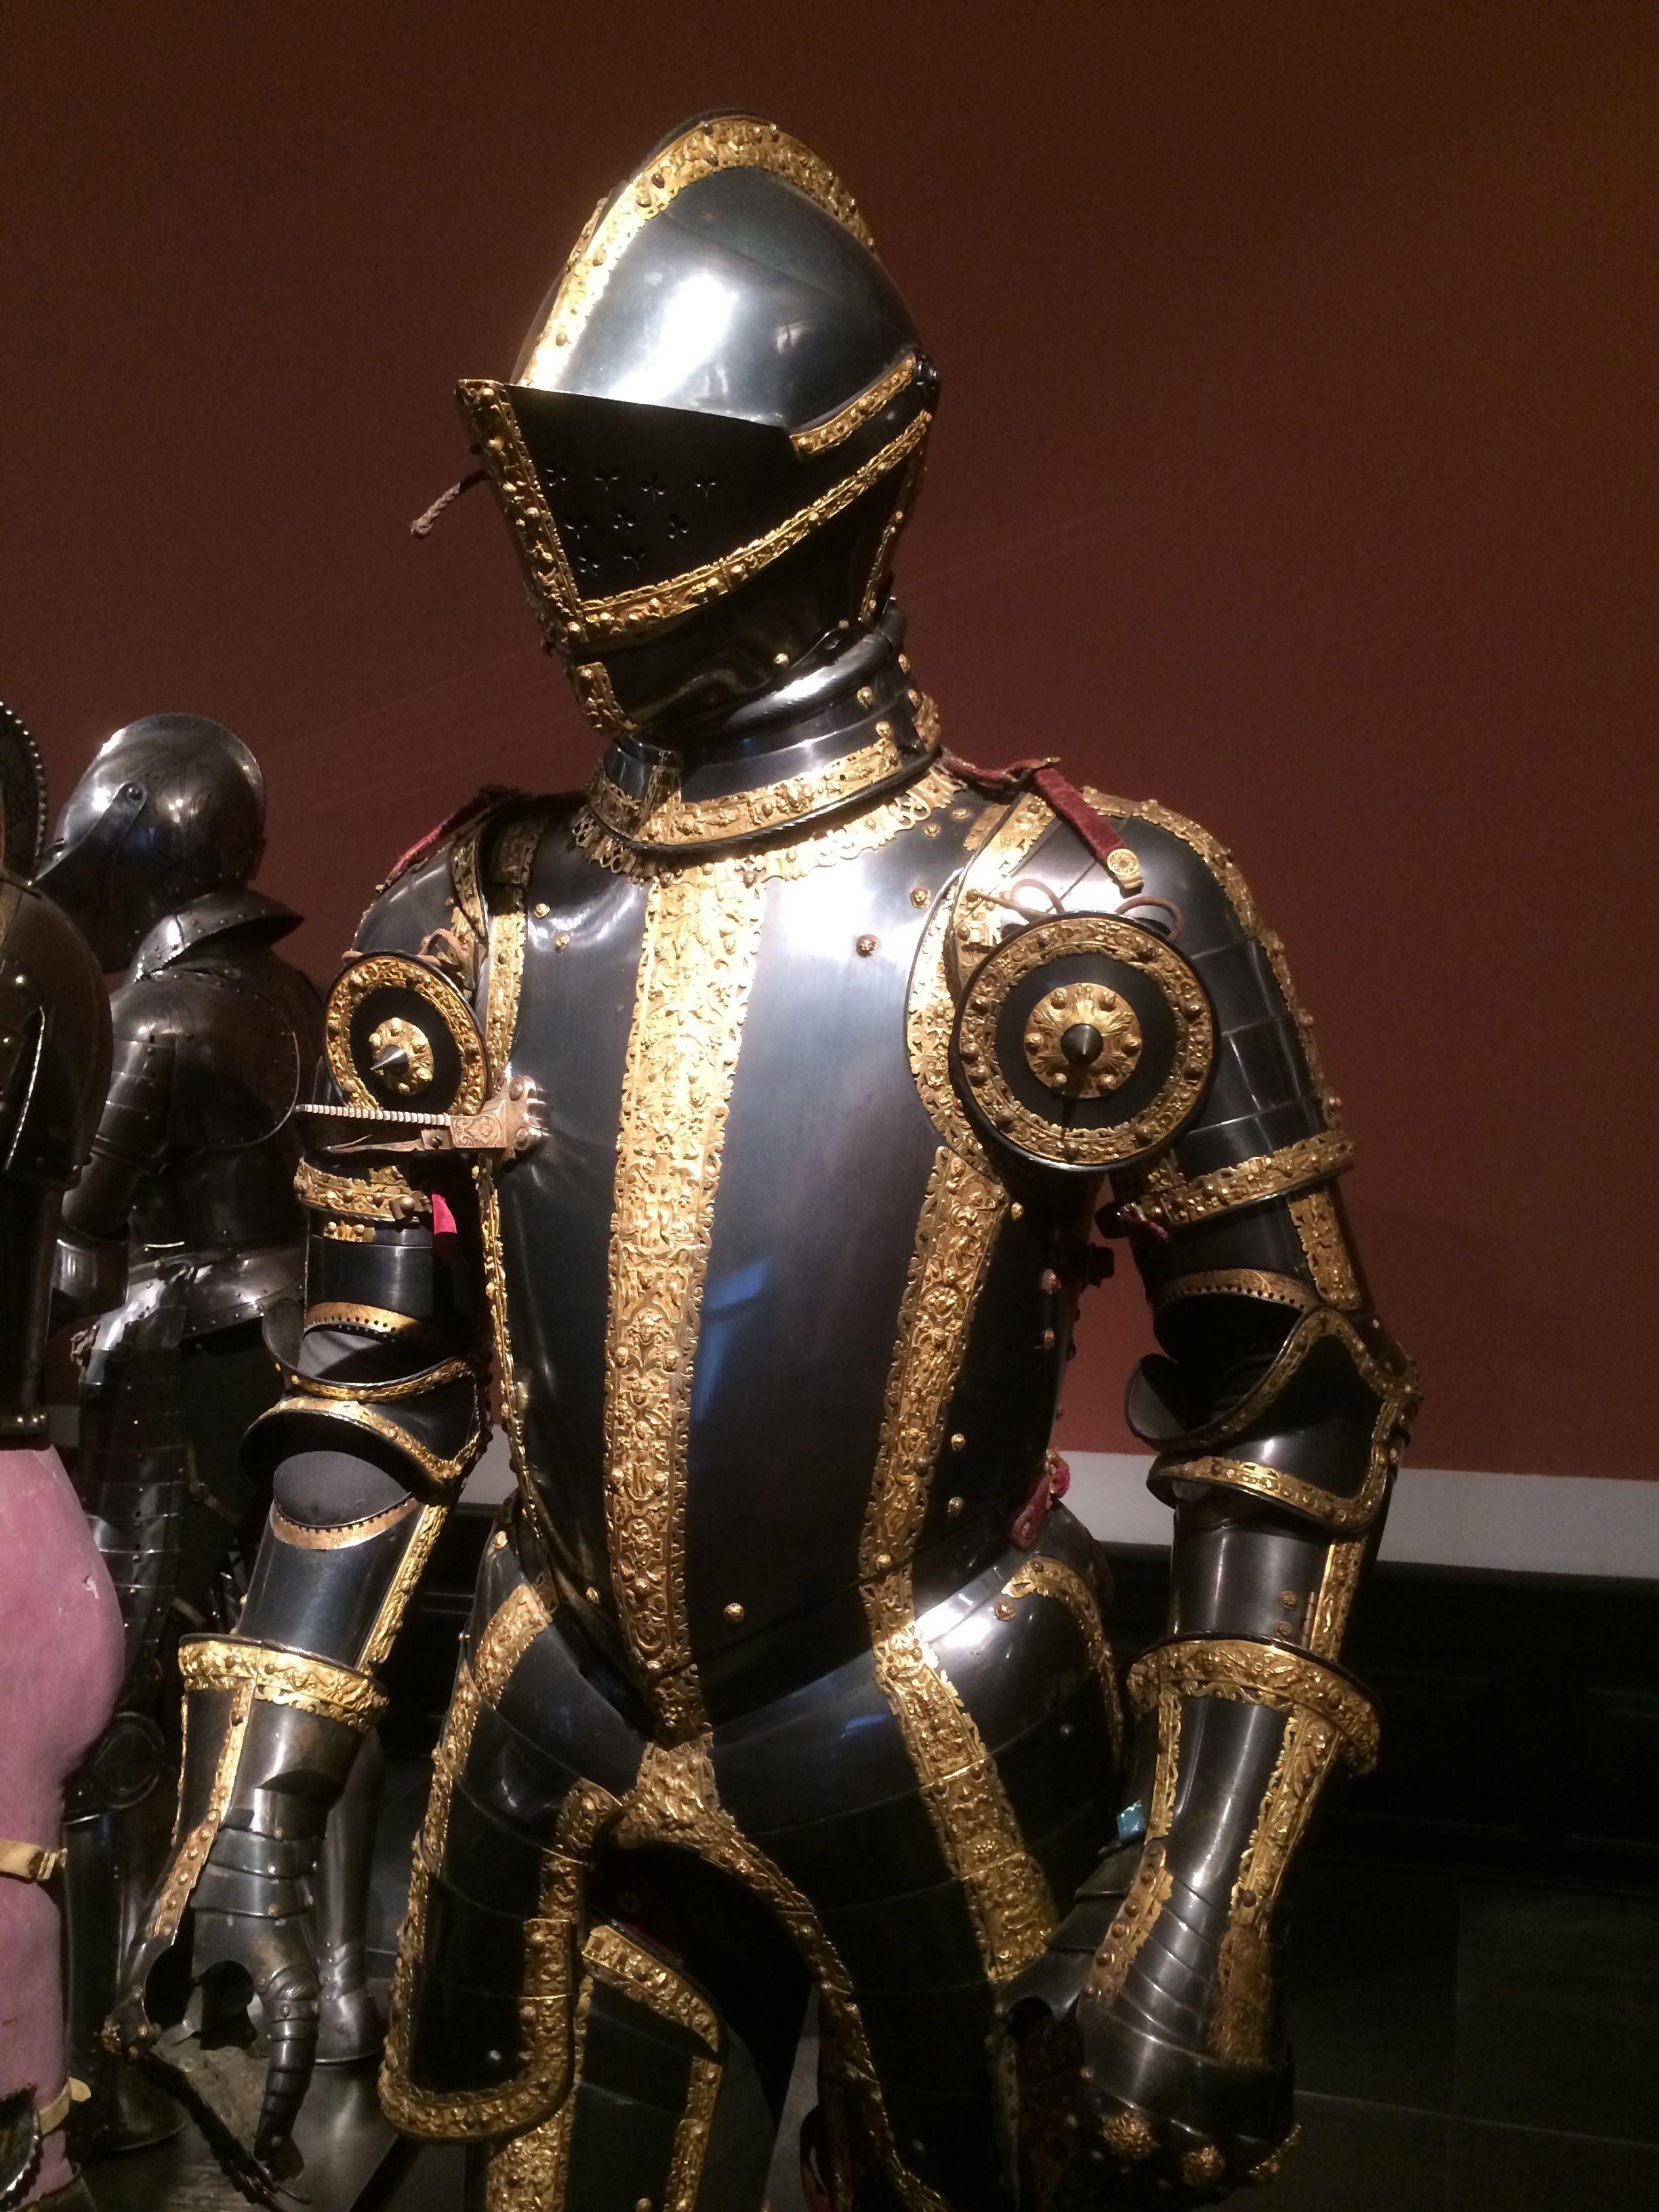 Augsburg 1544 - Kaiser Maximilian II Hofjagd - Wien Renaissance chlosed helmet armor